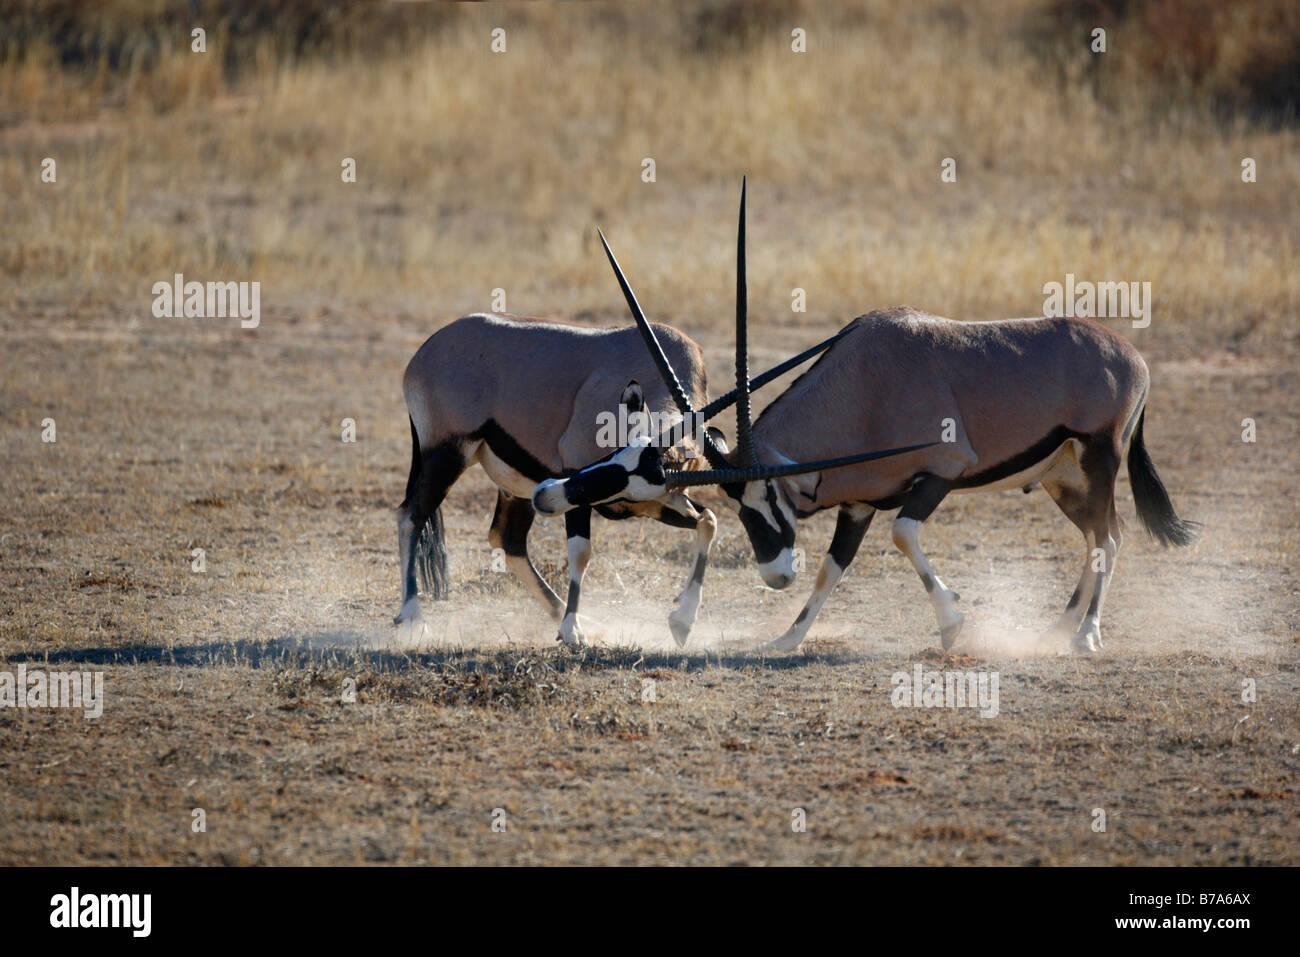 Two gemsbok (Oryx gazella) bulls fighting and kicking up dust Stock Photo